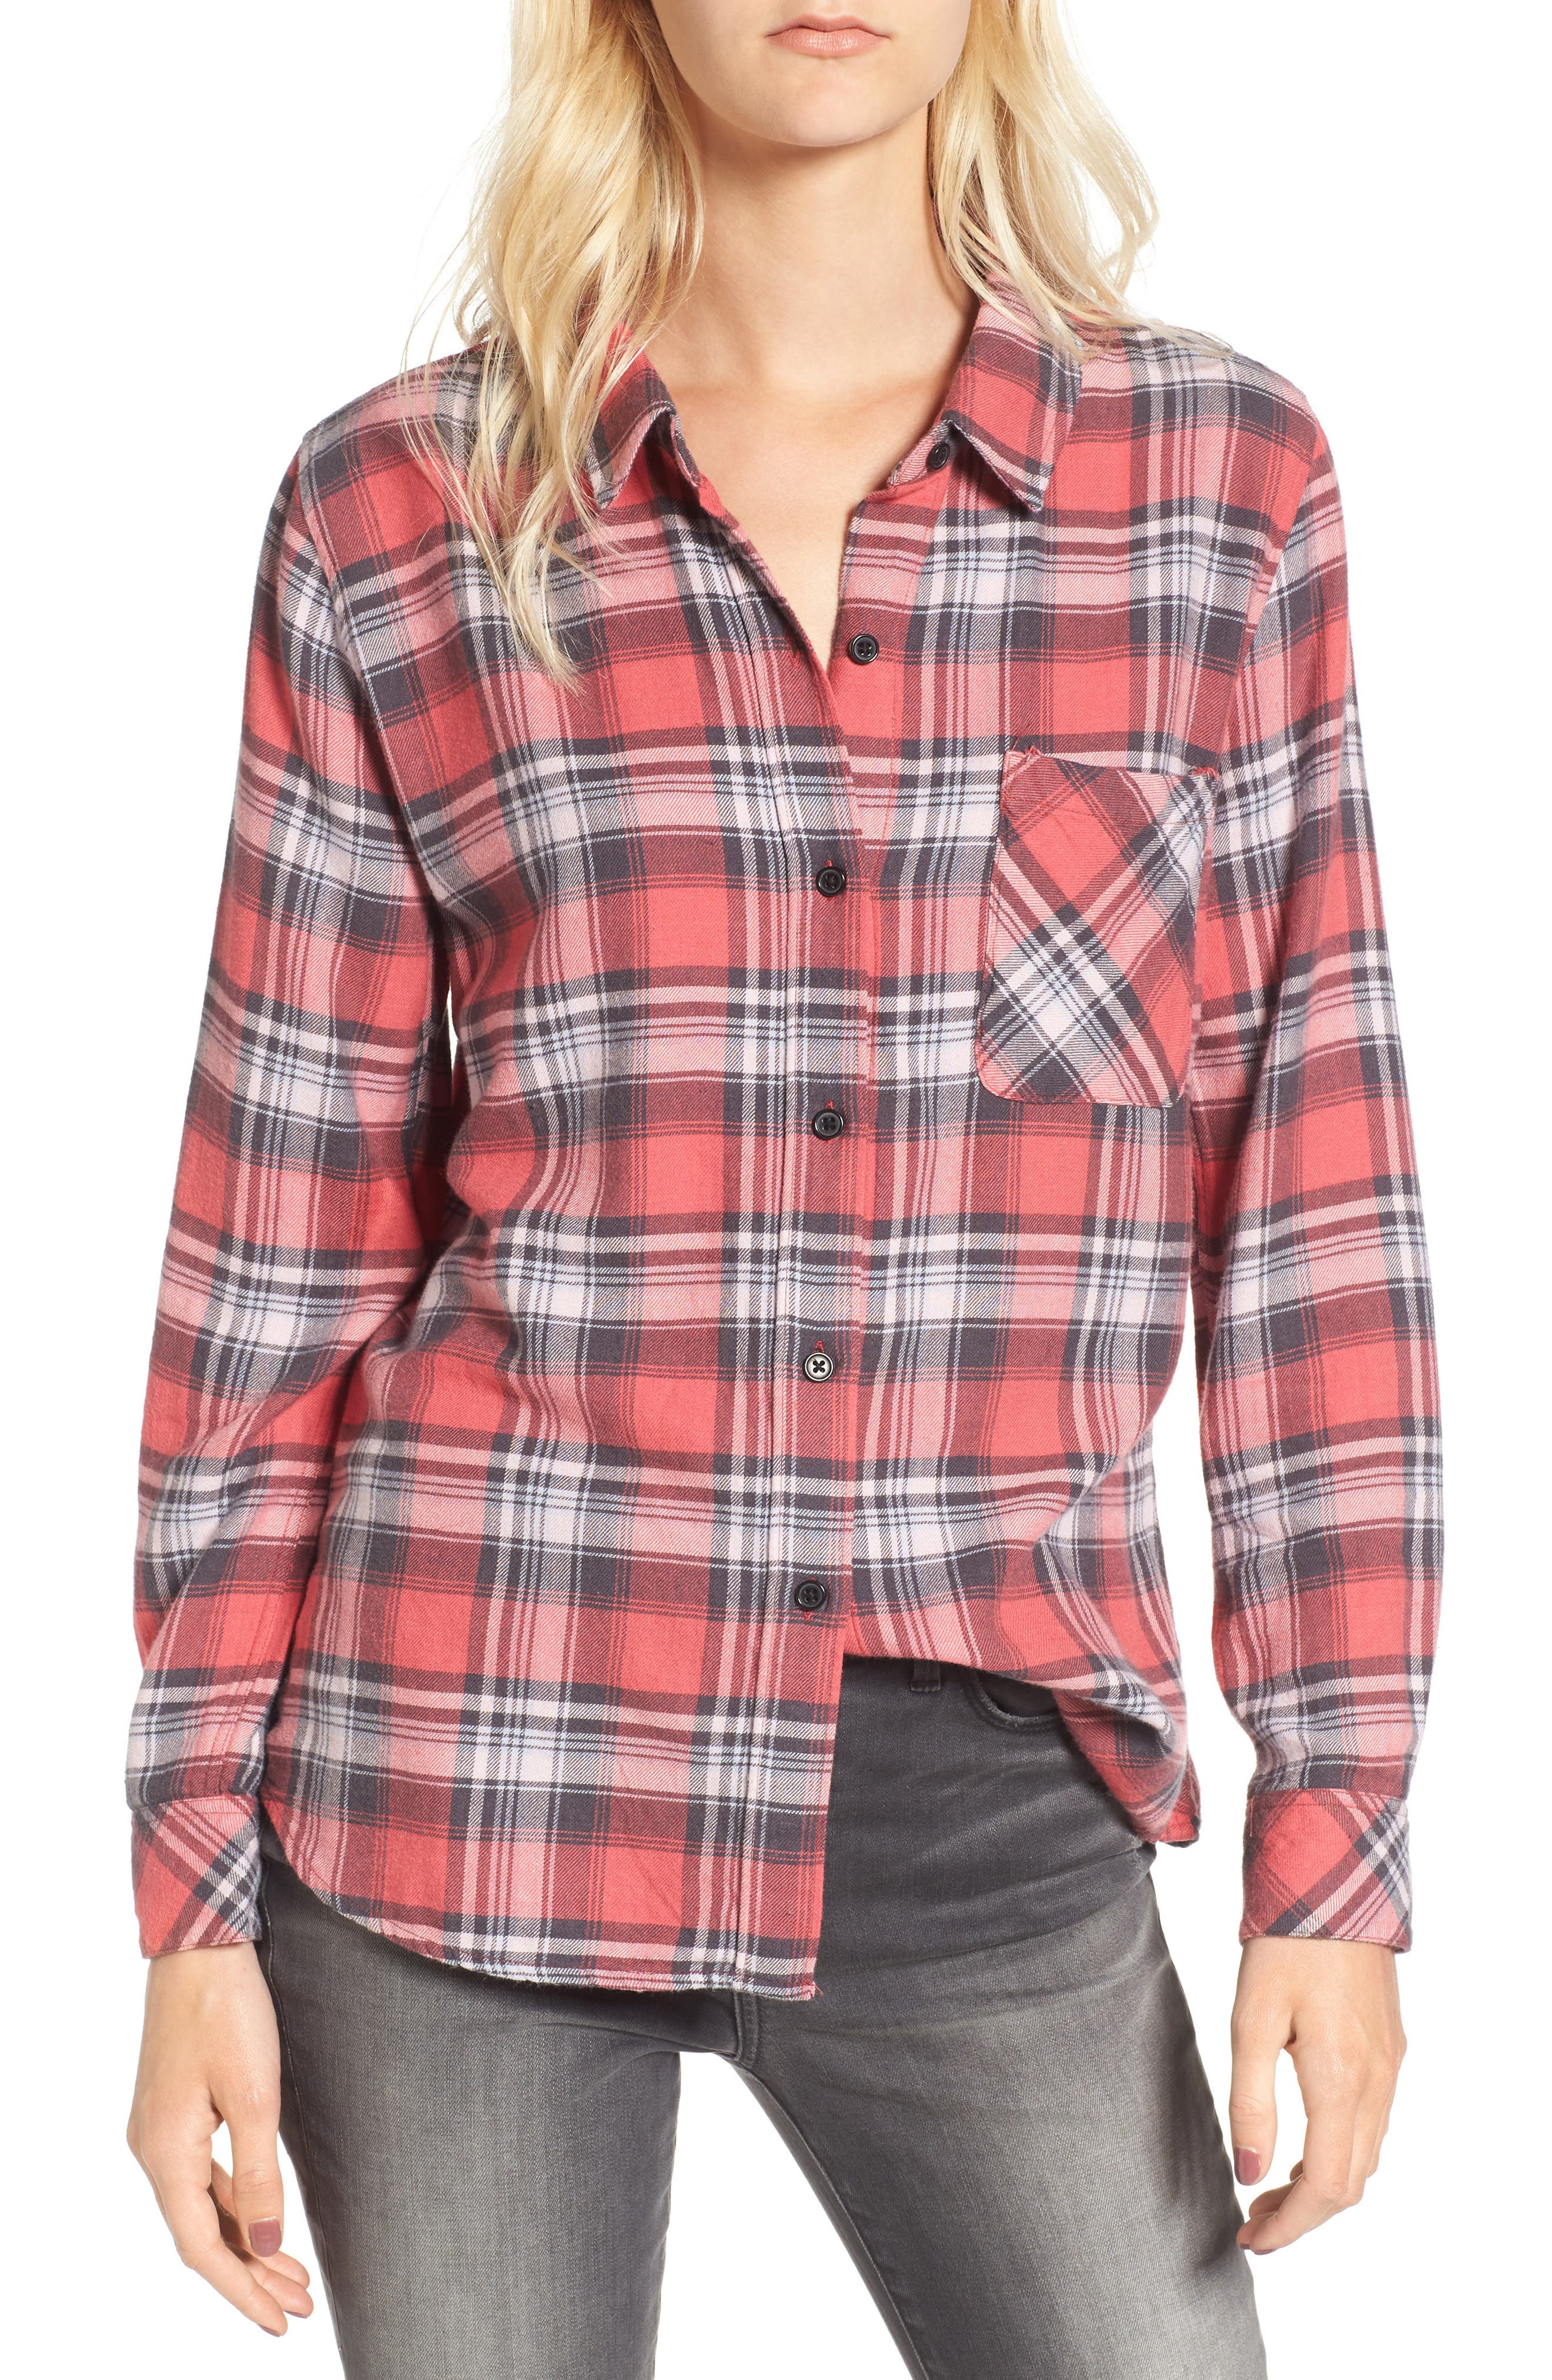 Milo Plaid Shirt,                             Main thumbnail 1, color,                             Bonfire/ Ash